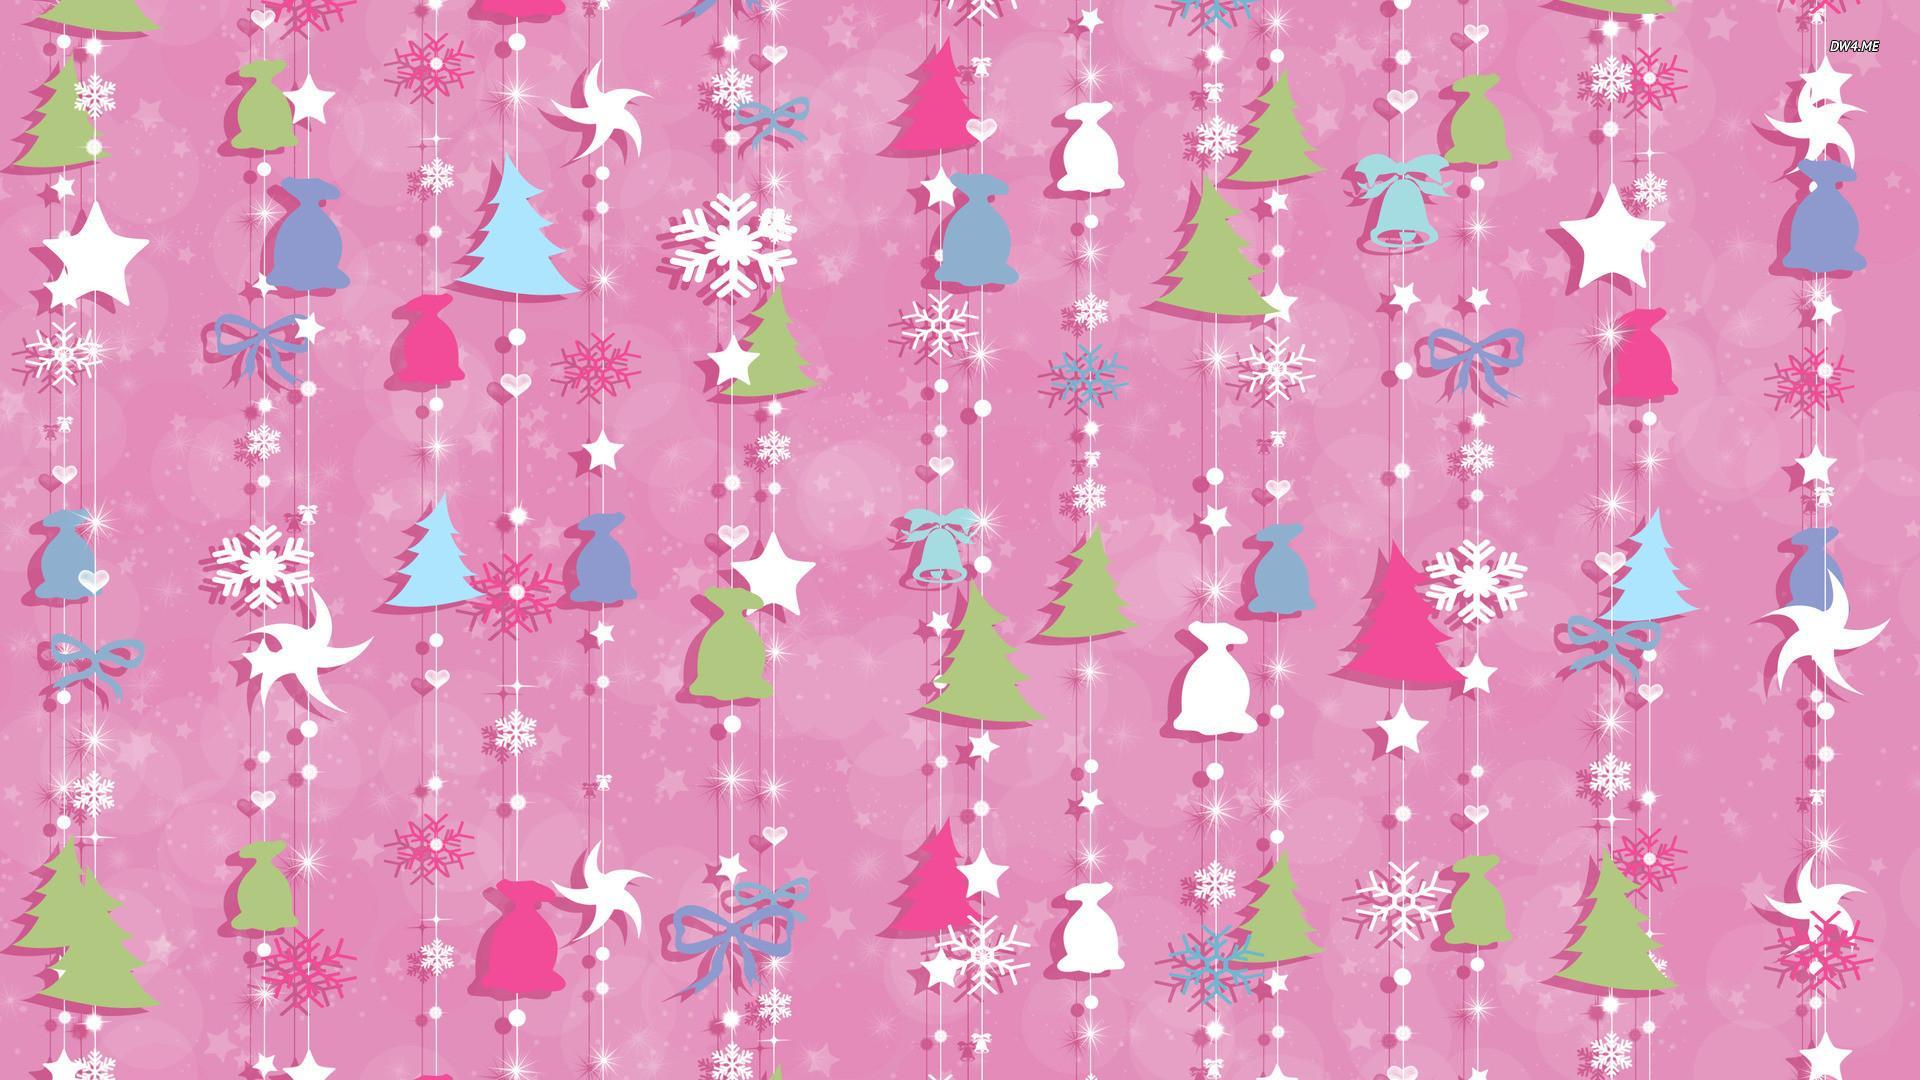 Pastel Christmas Desktop Wallpapers Wallpaper Cave